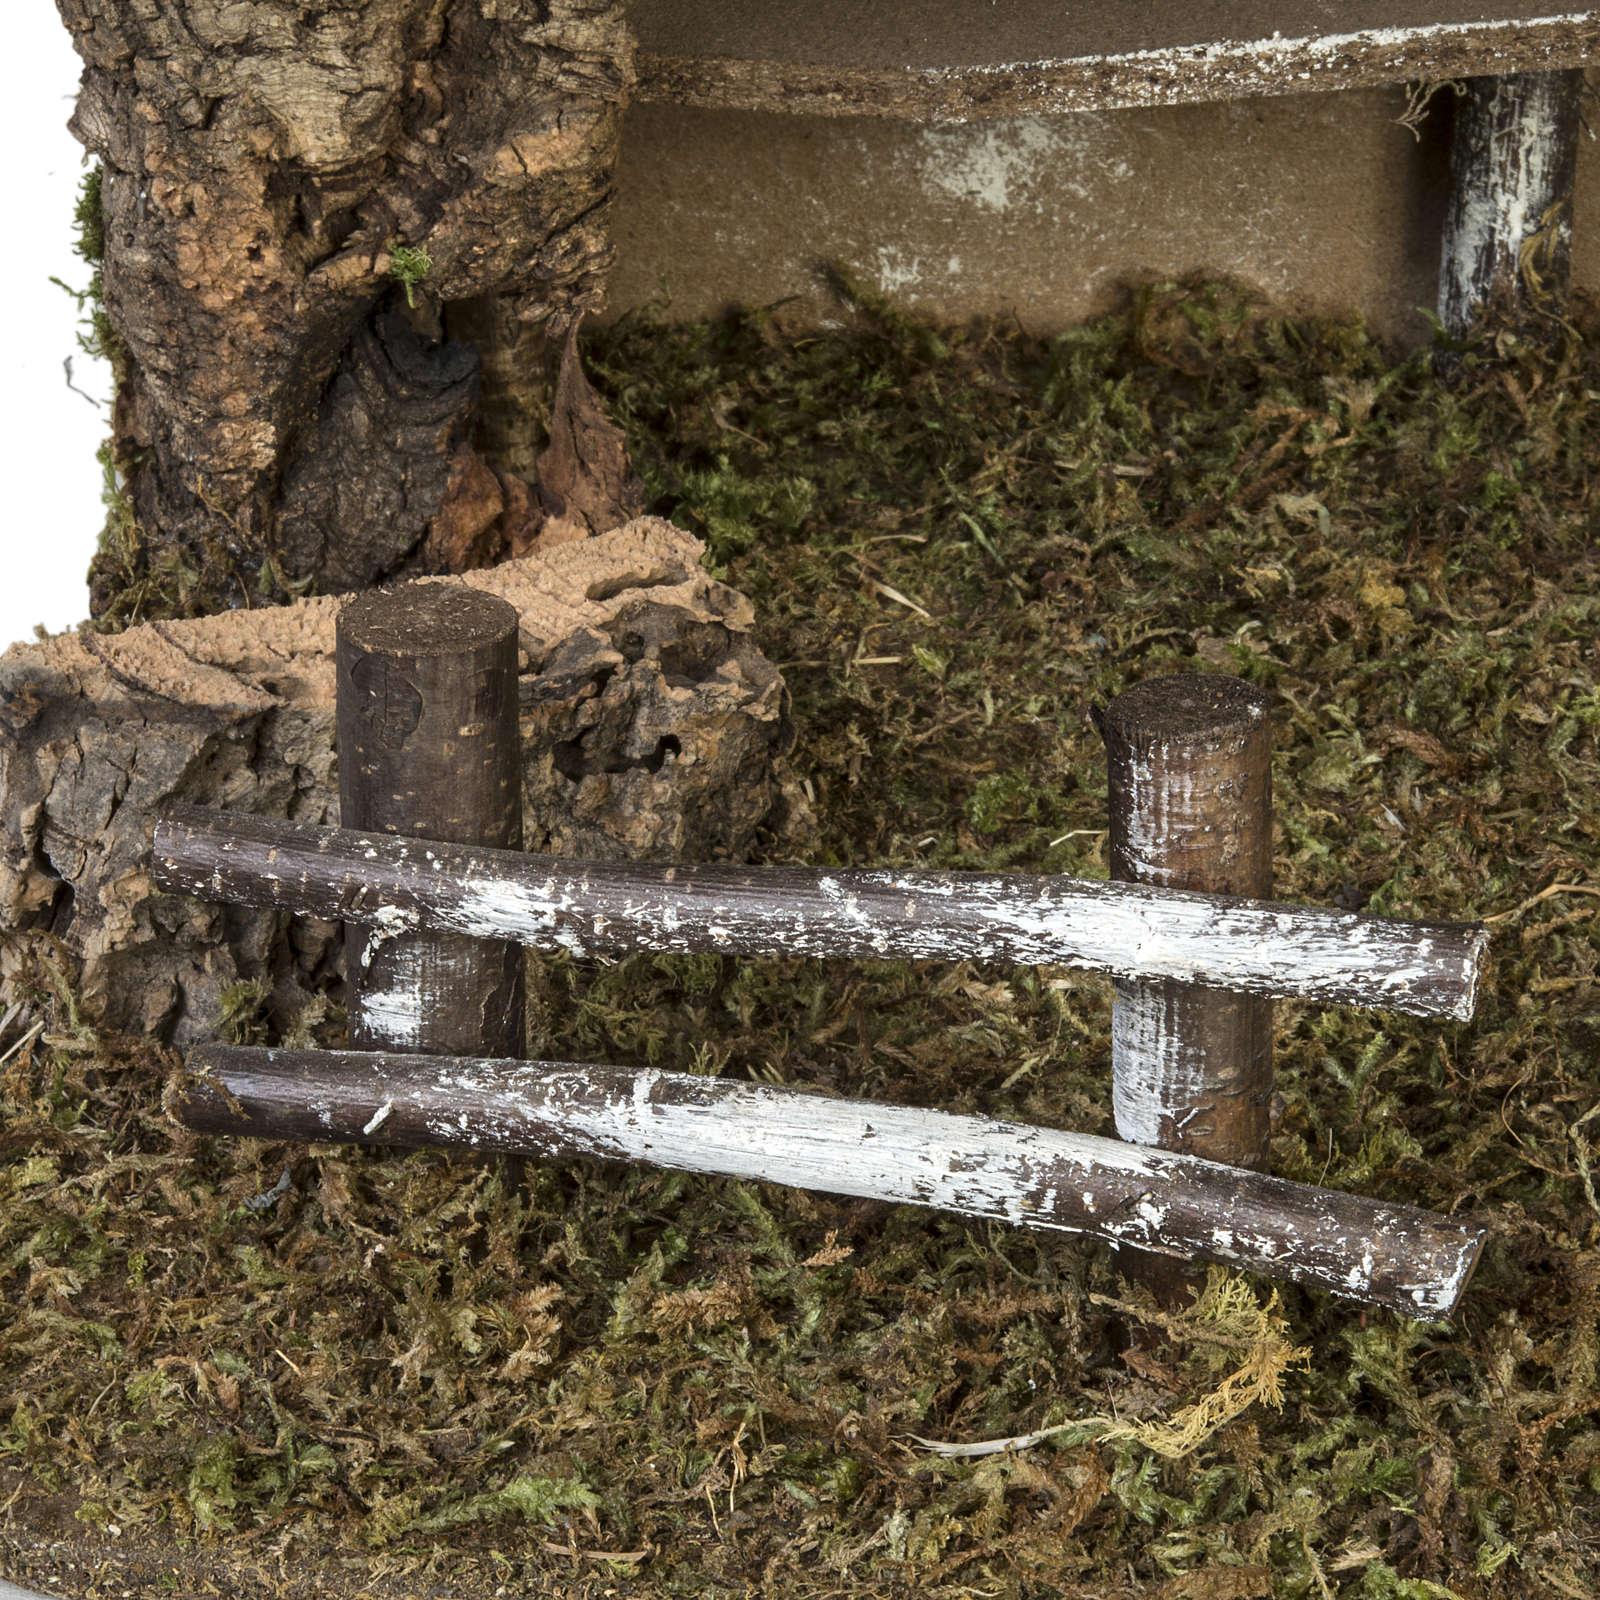 Capanna presepe semplice sughero e muschio 38x58x34 cm 4